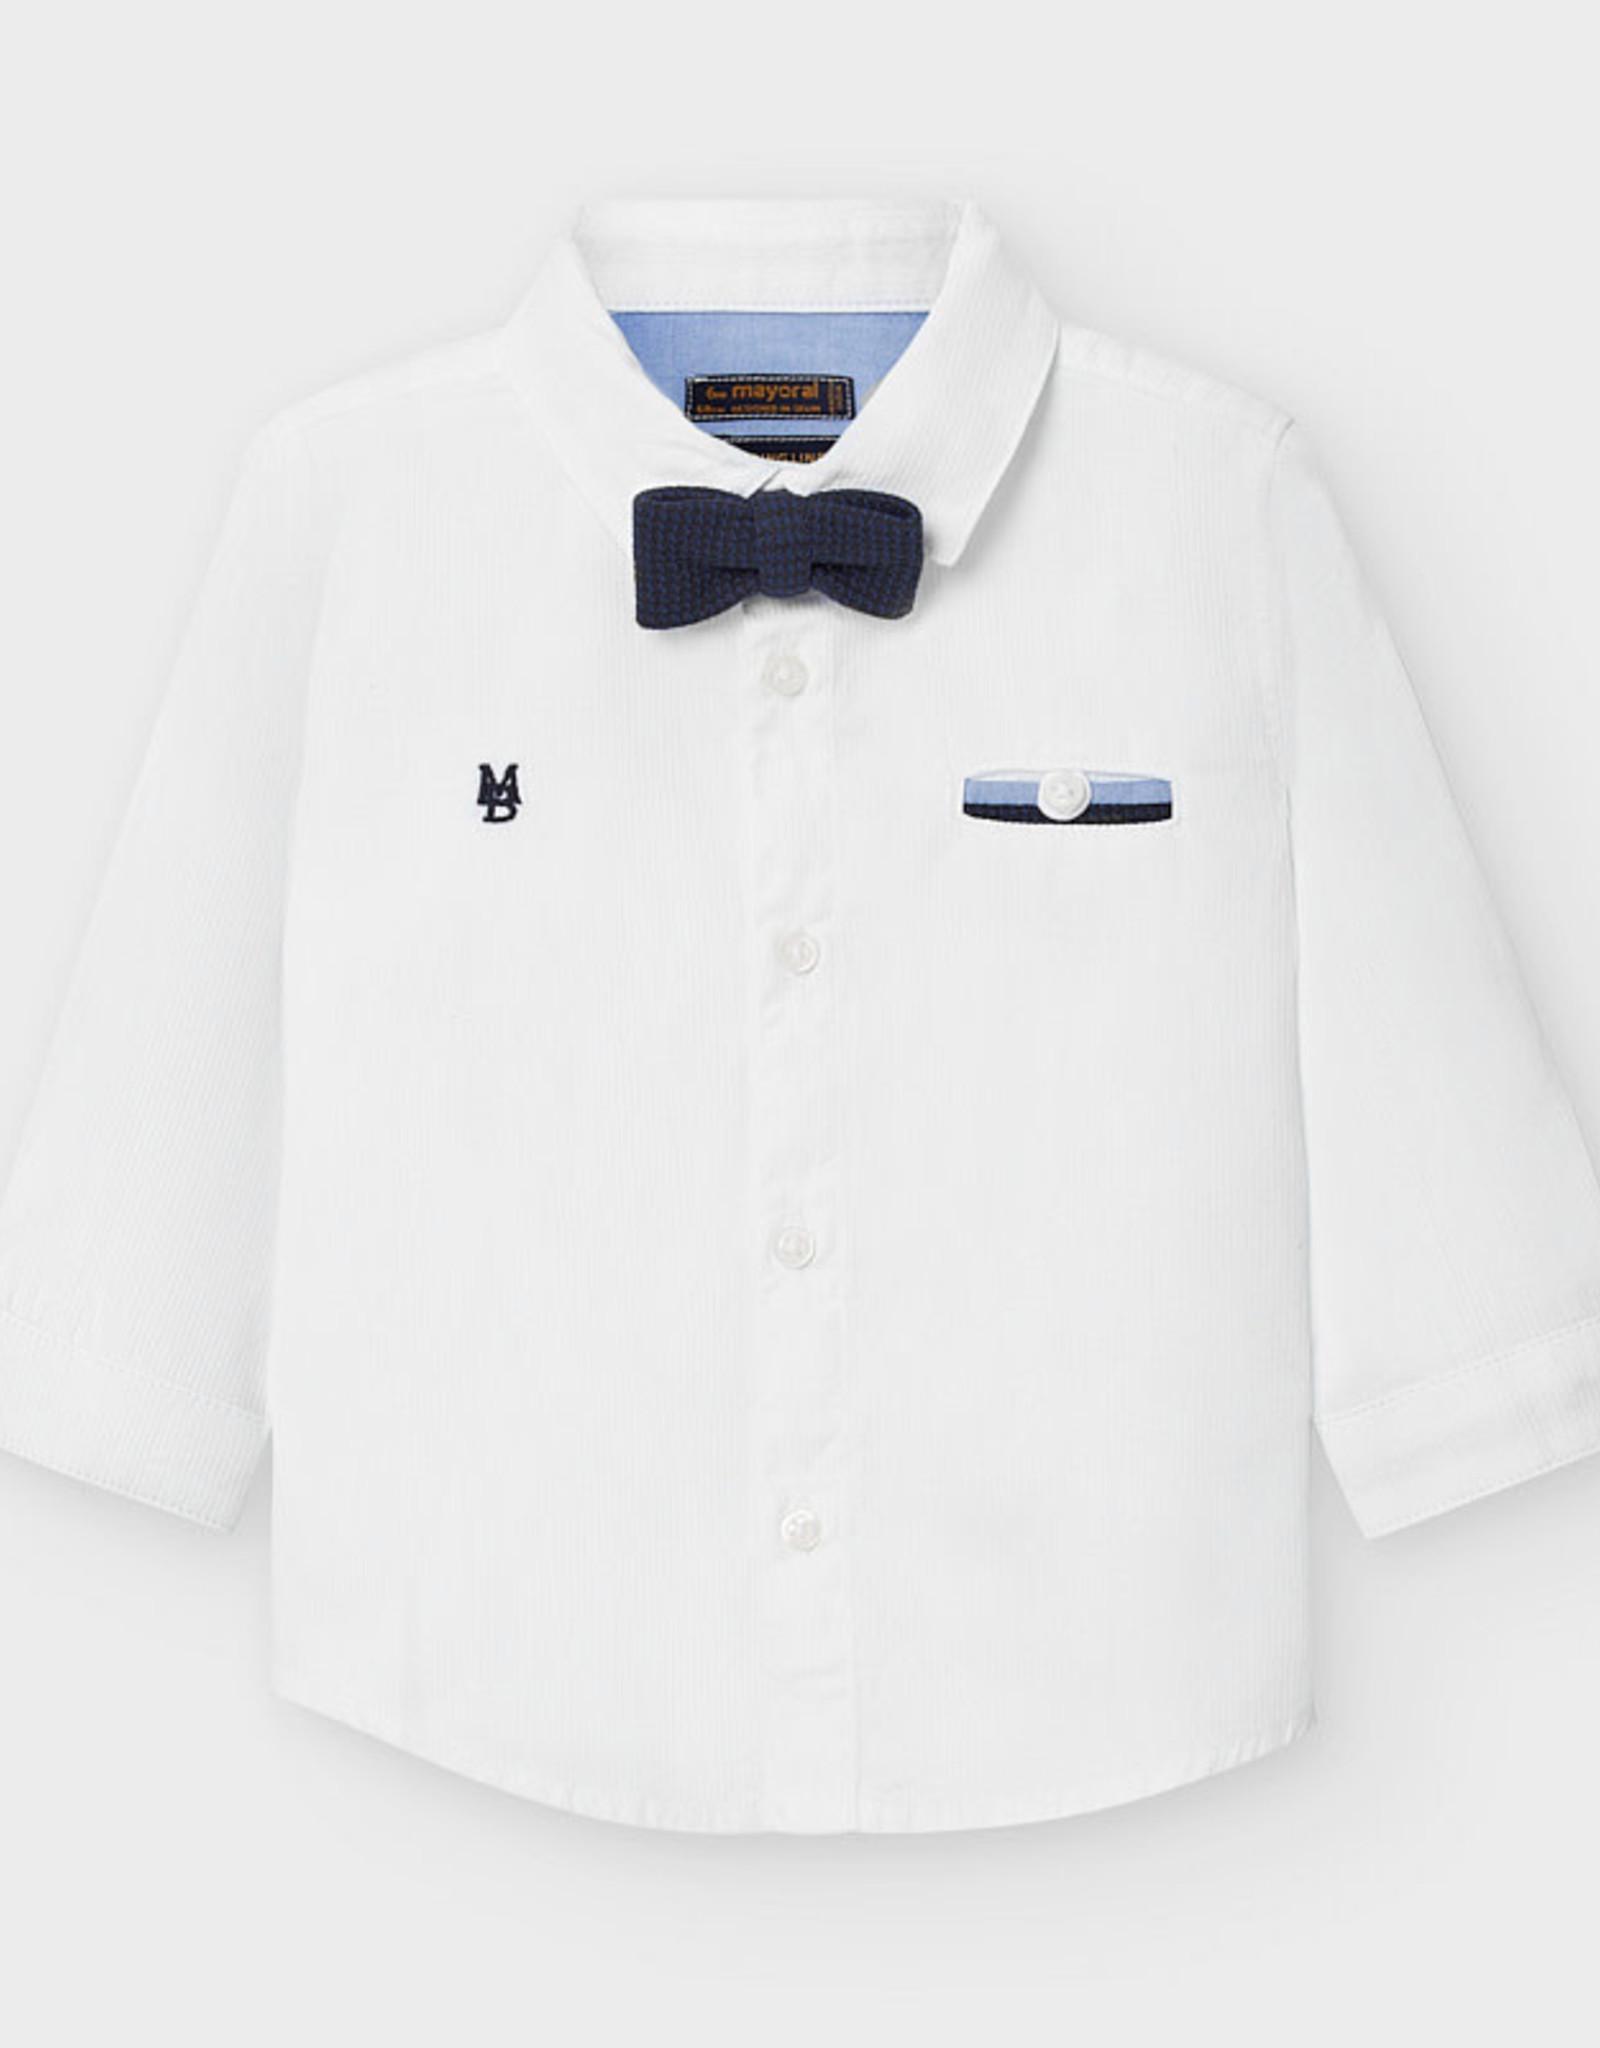 Mayoral Mayoral Long Sleeve Dress Shirt W/ Bow